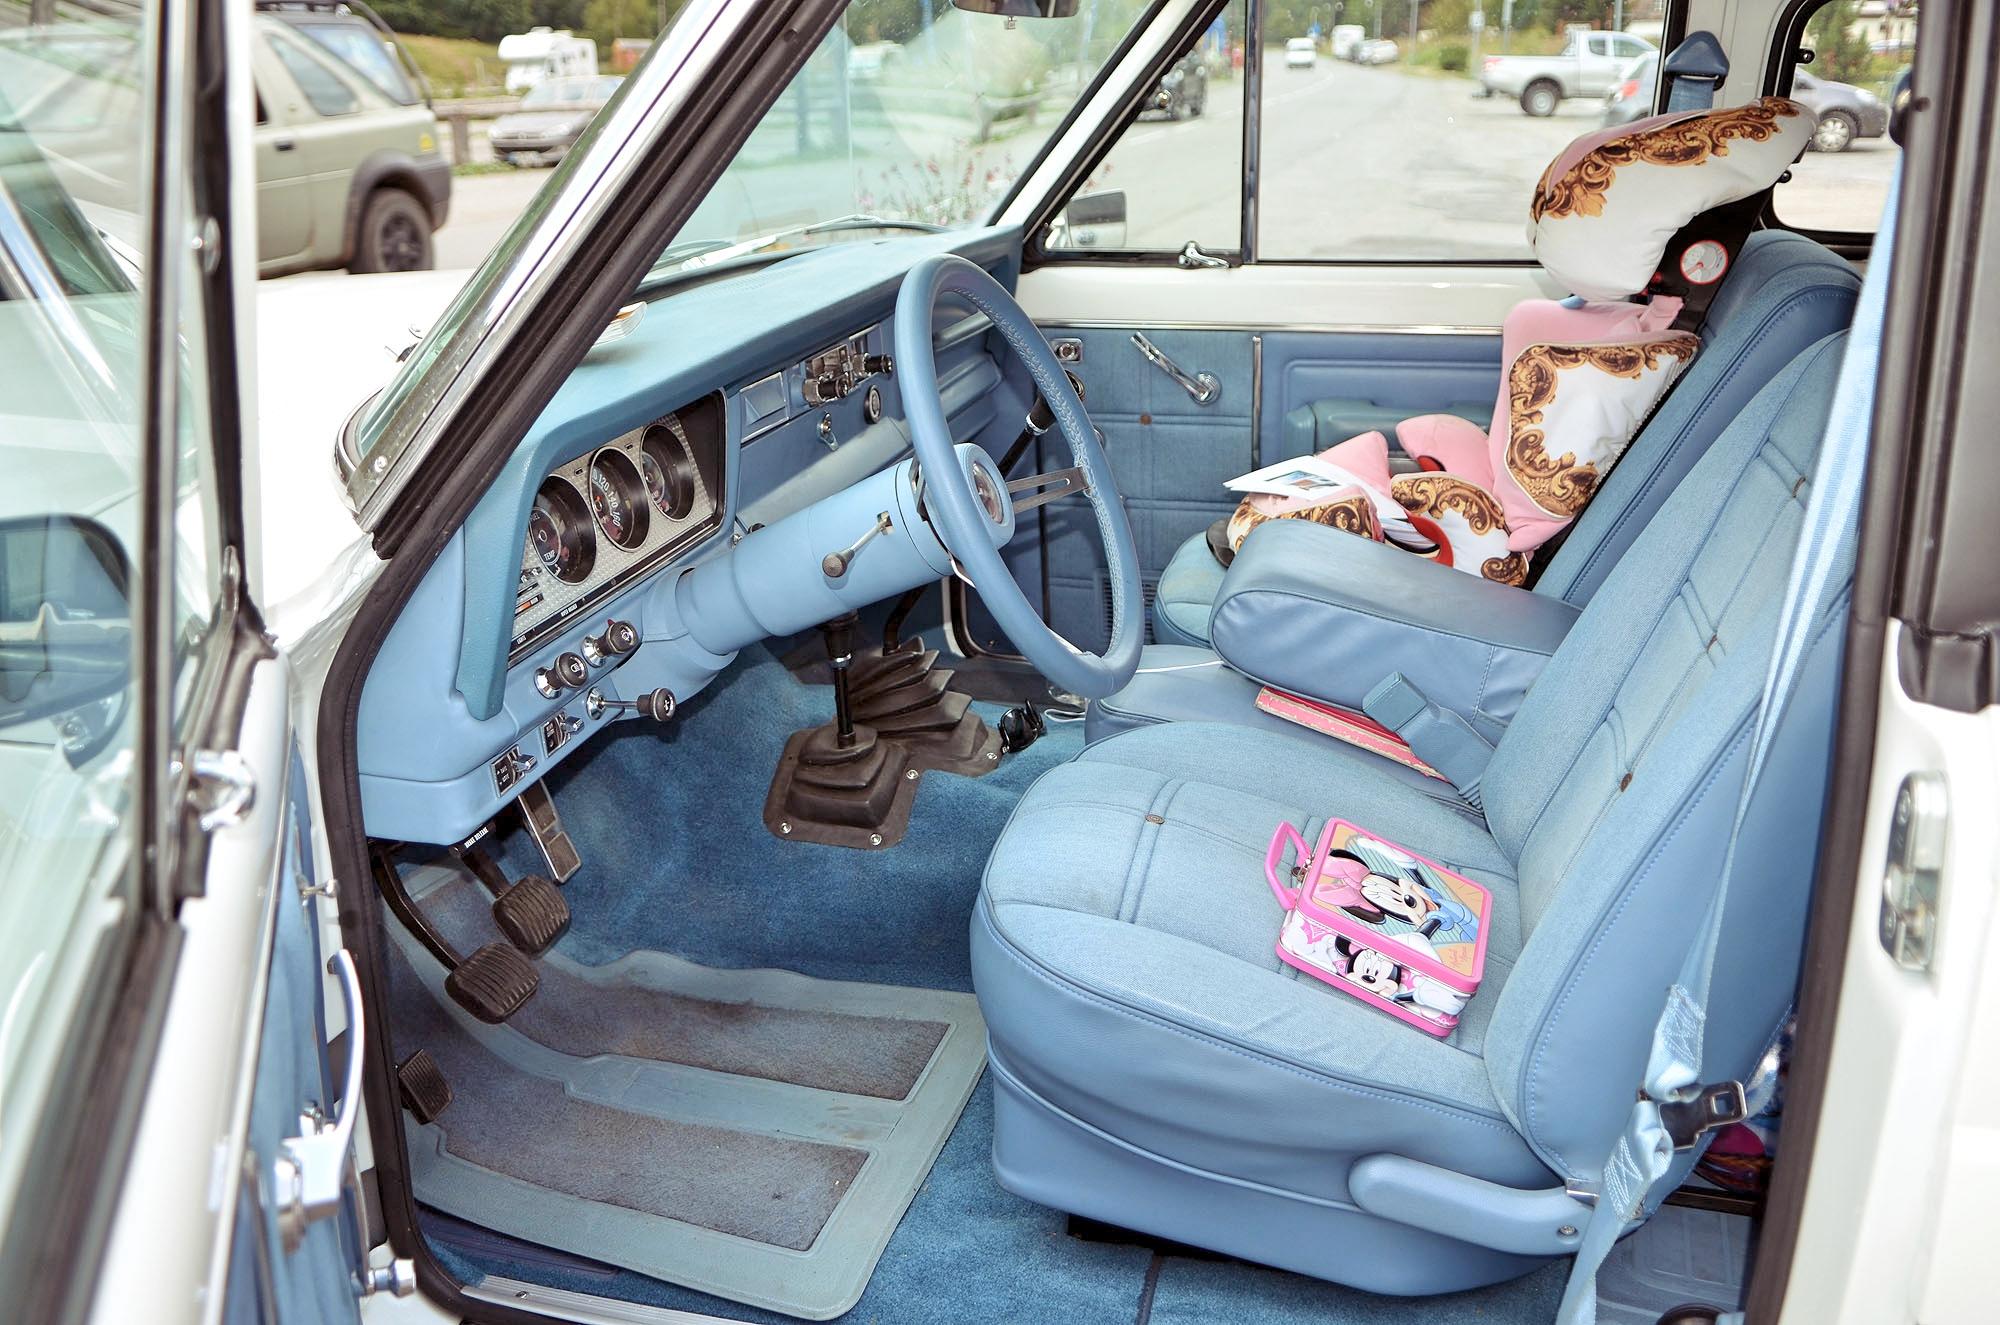 jeep-cherokee-chief-valloire-064.JPG